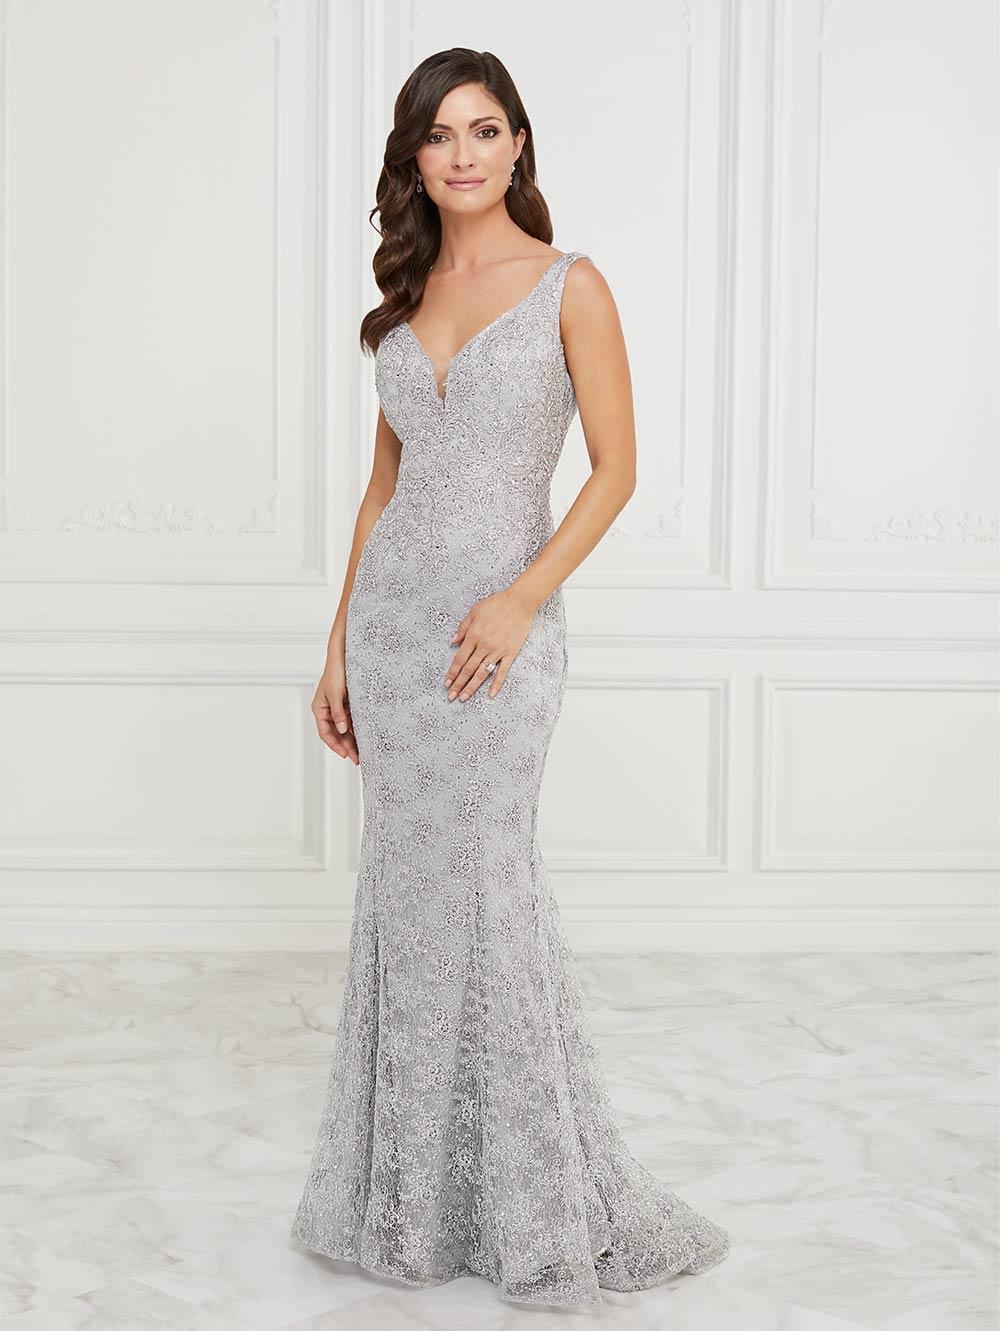 special-occasion-dresses-jacquelin-bridals-canada-27697